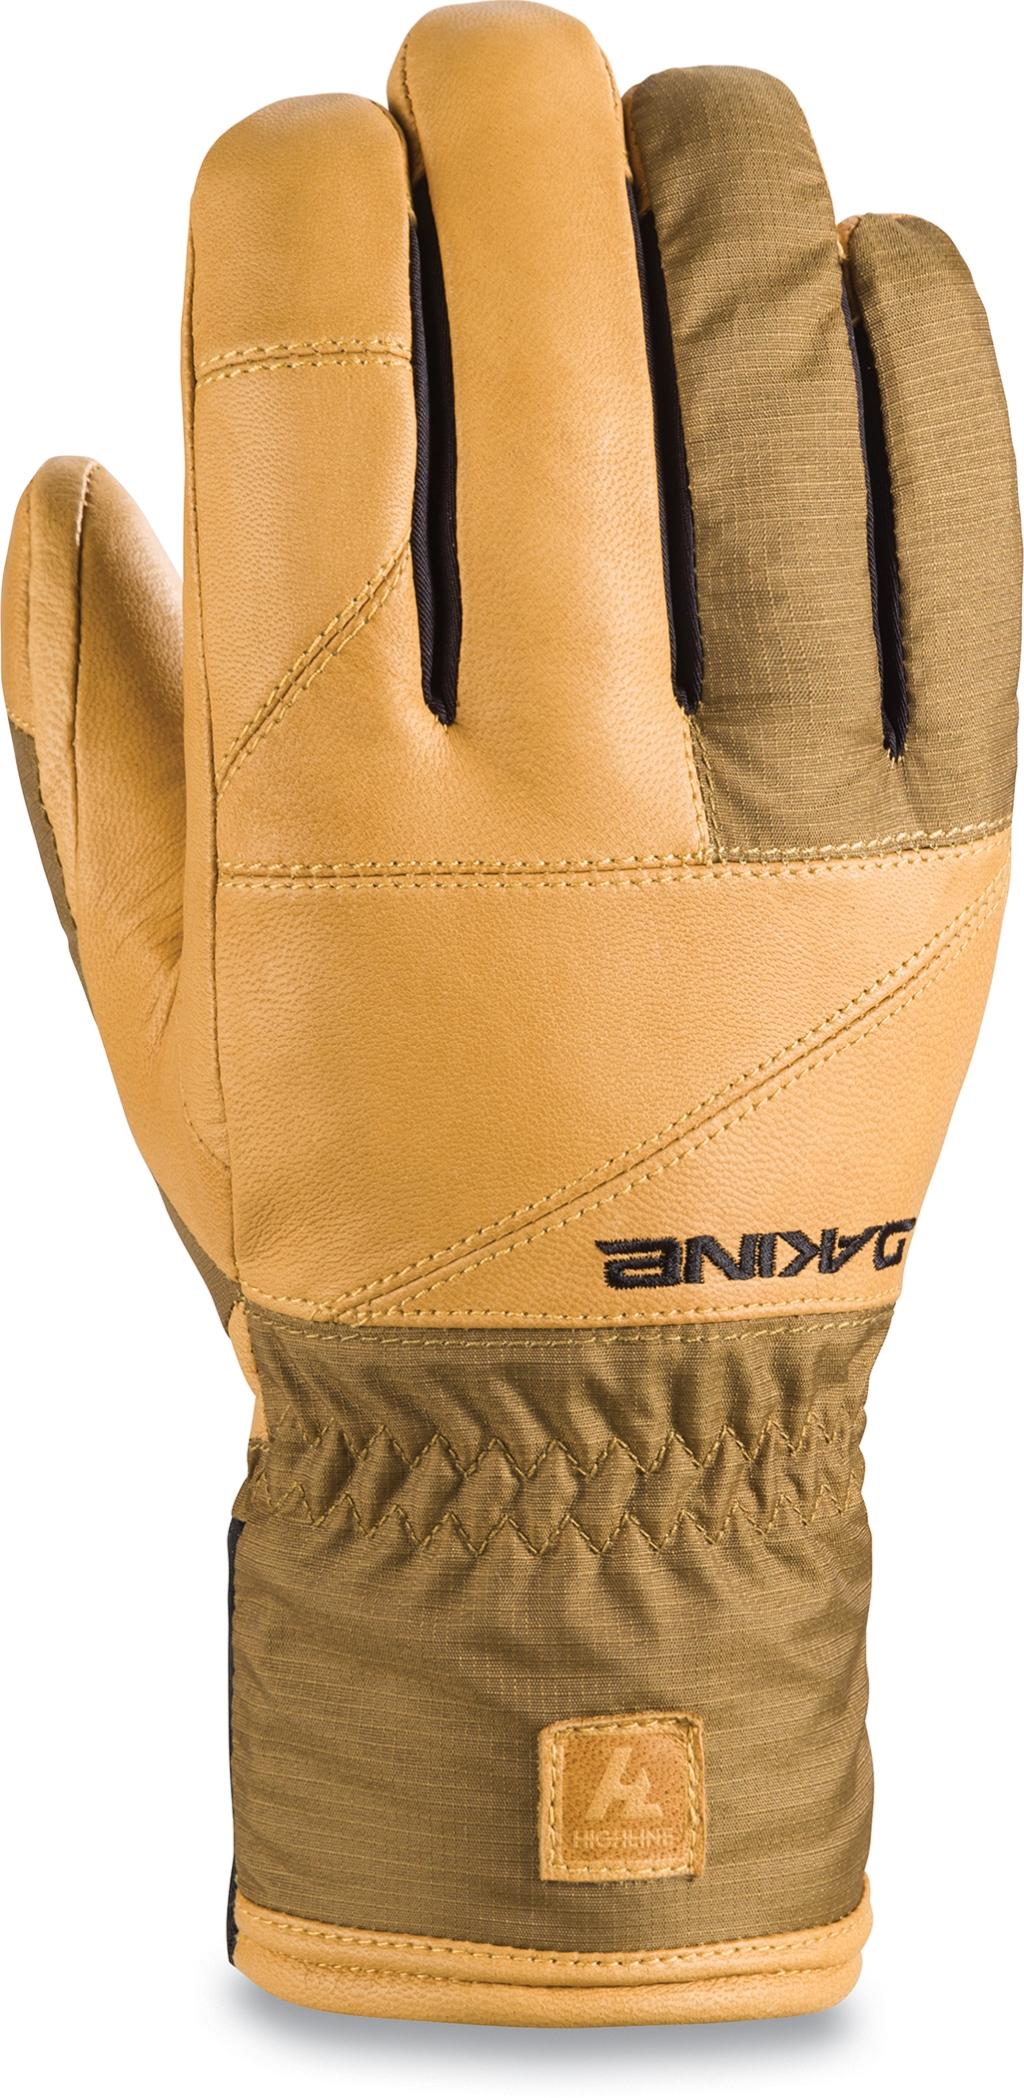 sprzedaje najtańszy niska cena Dakine Pacer Glove Buckskin - us